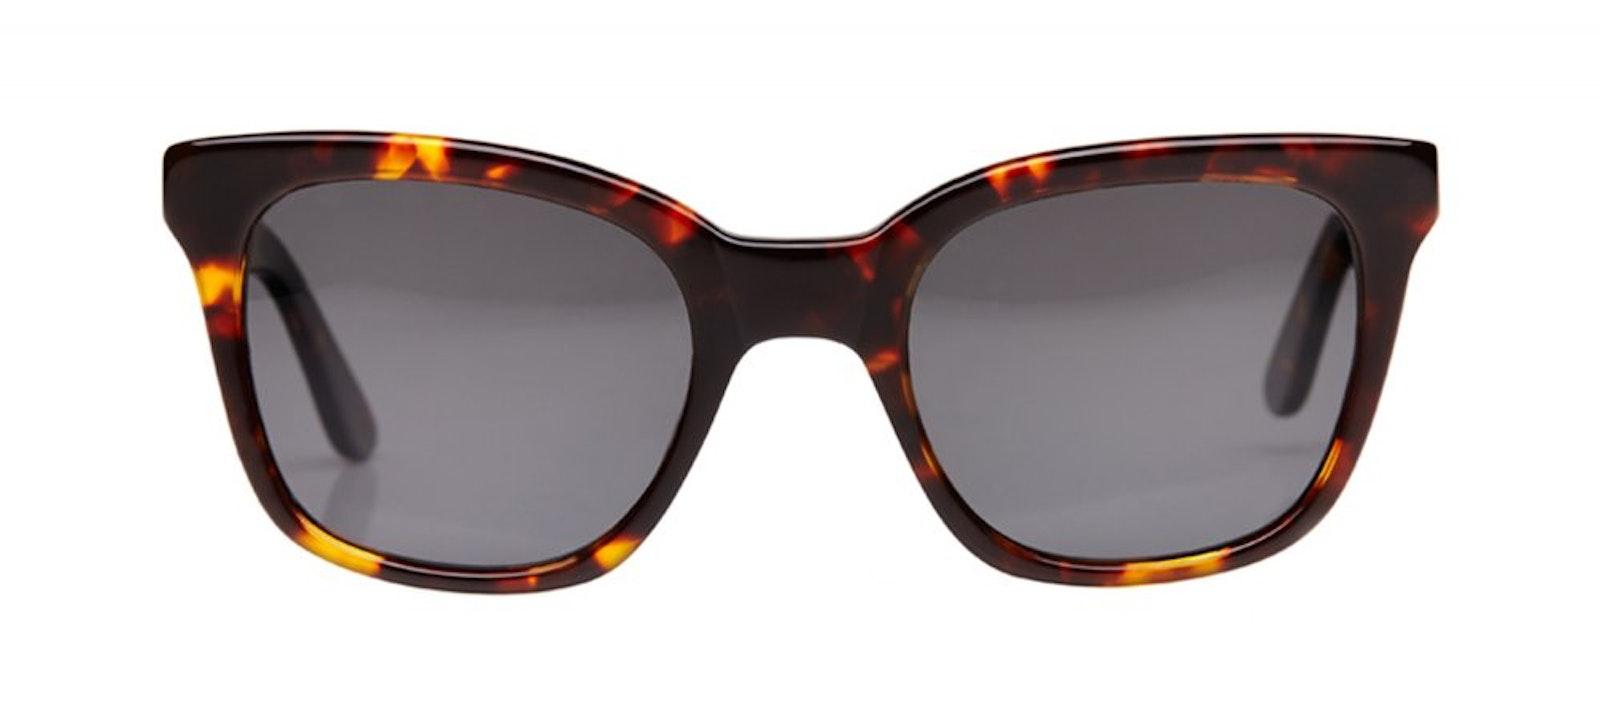 a3ad50f924 Jack   Norma. Previous. Affordable Fashion Glasses Rectangle Square  Sunglasses Women ...